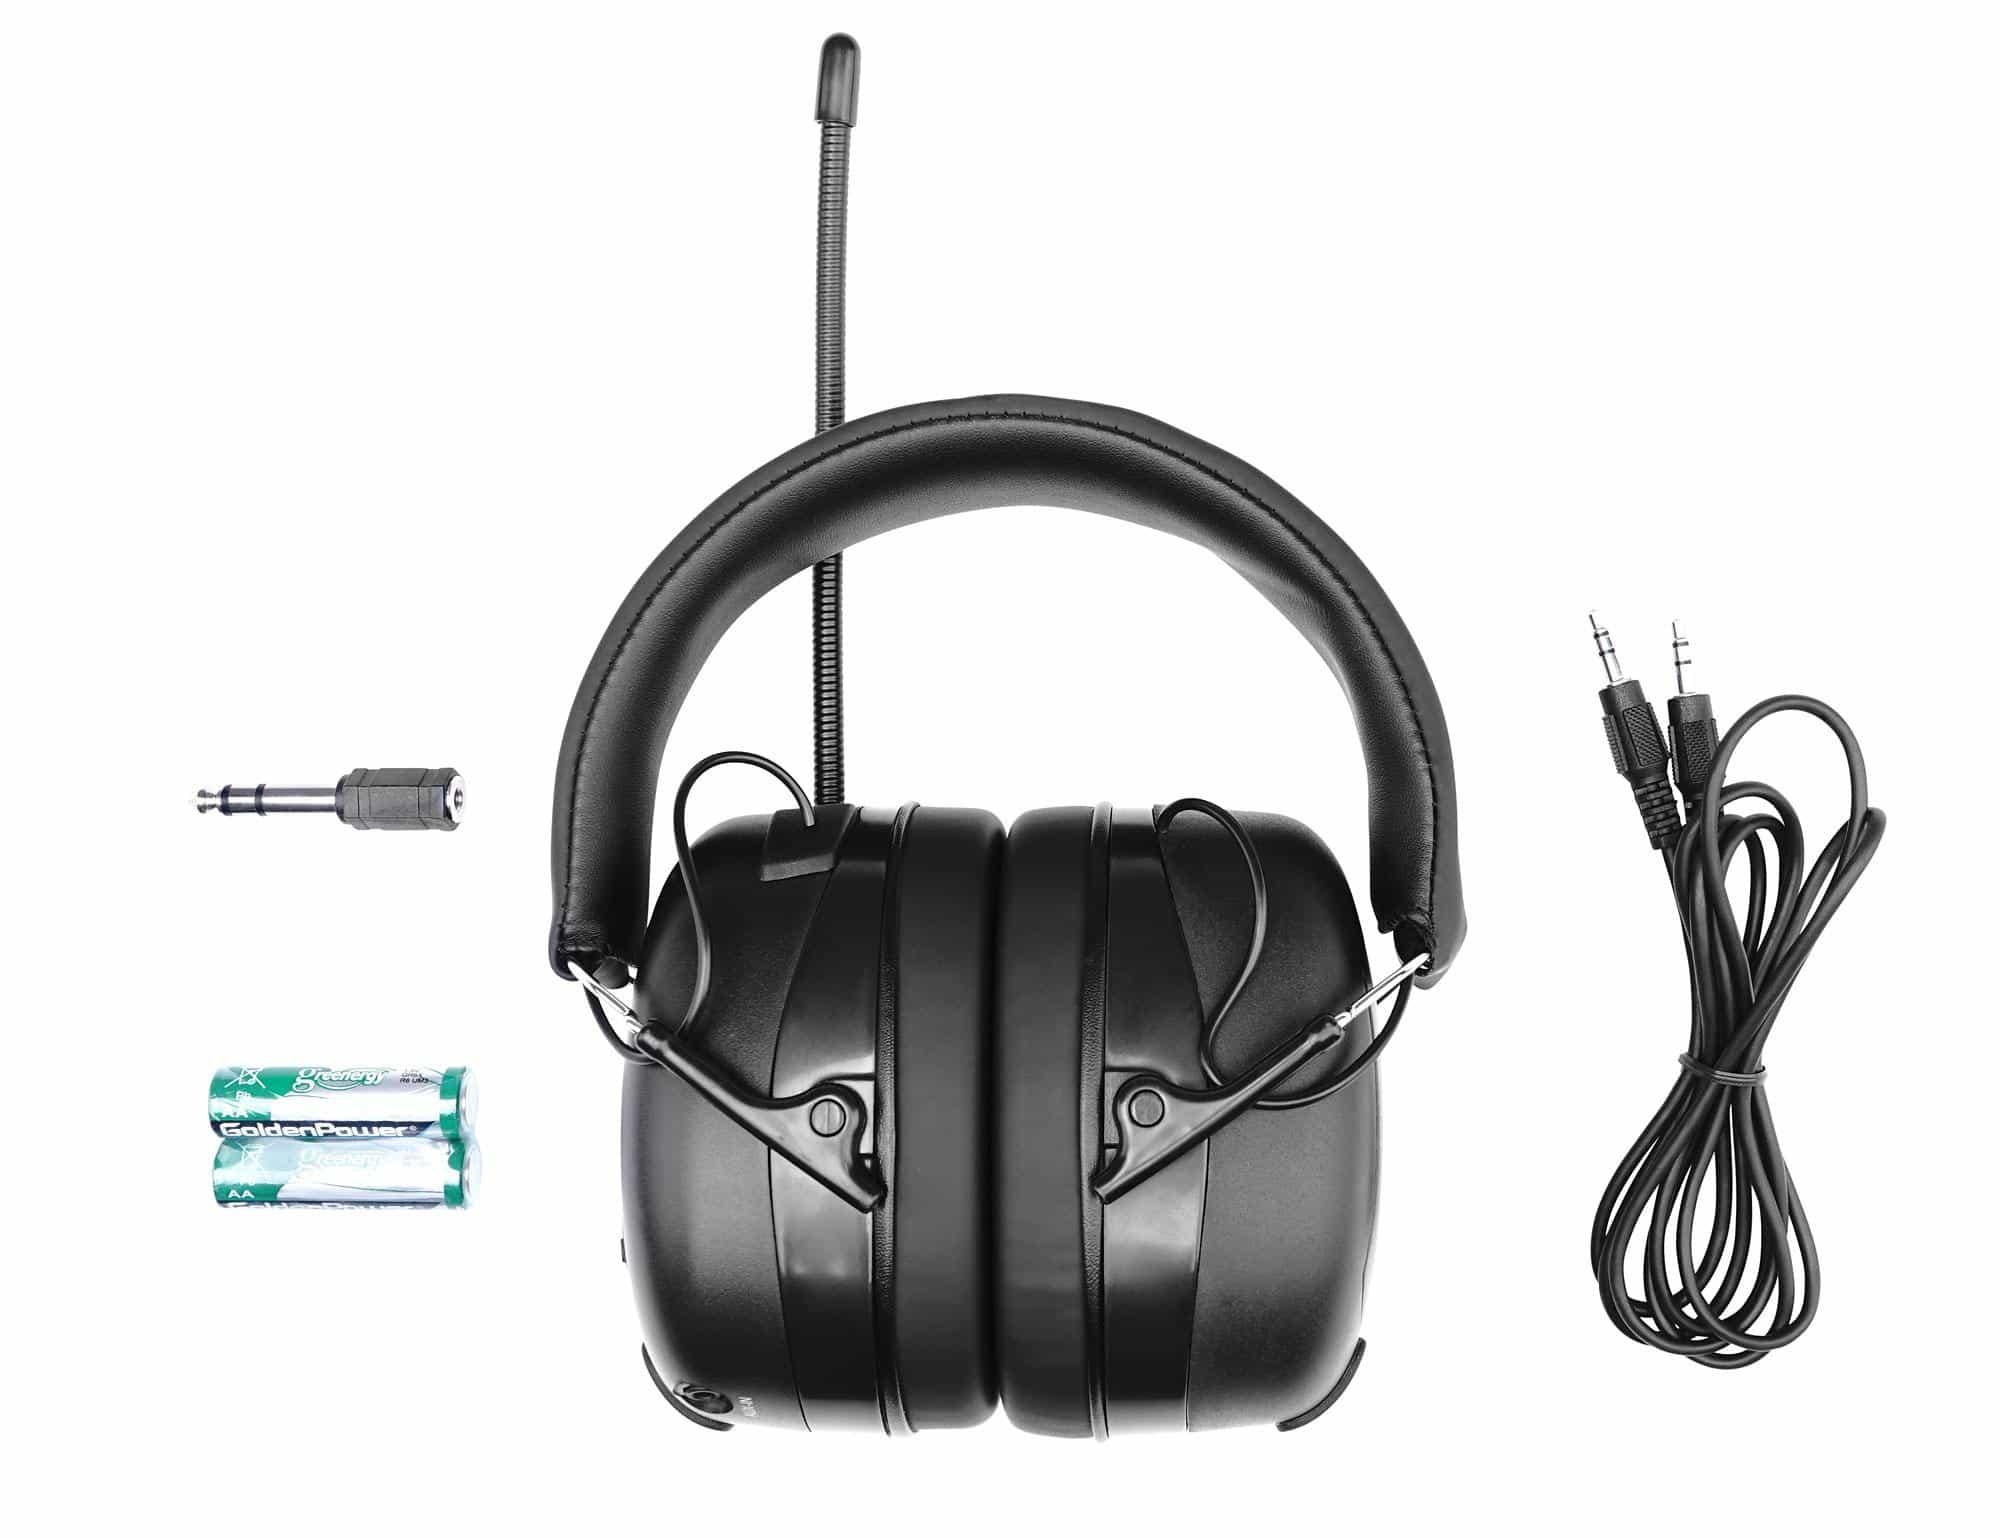 beatfoxx ih 2b tough phones casque anti bruits avec radio fm. Black Bedroom Furniture Sets. Home Design Ideas